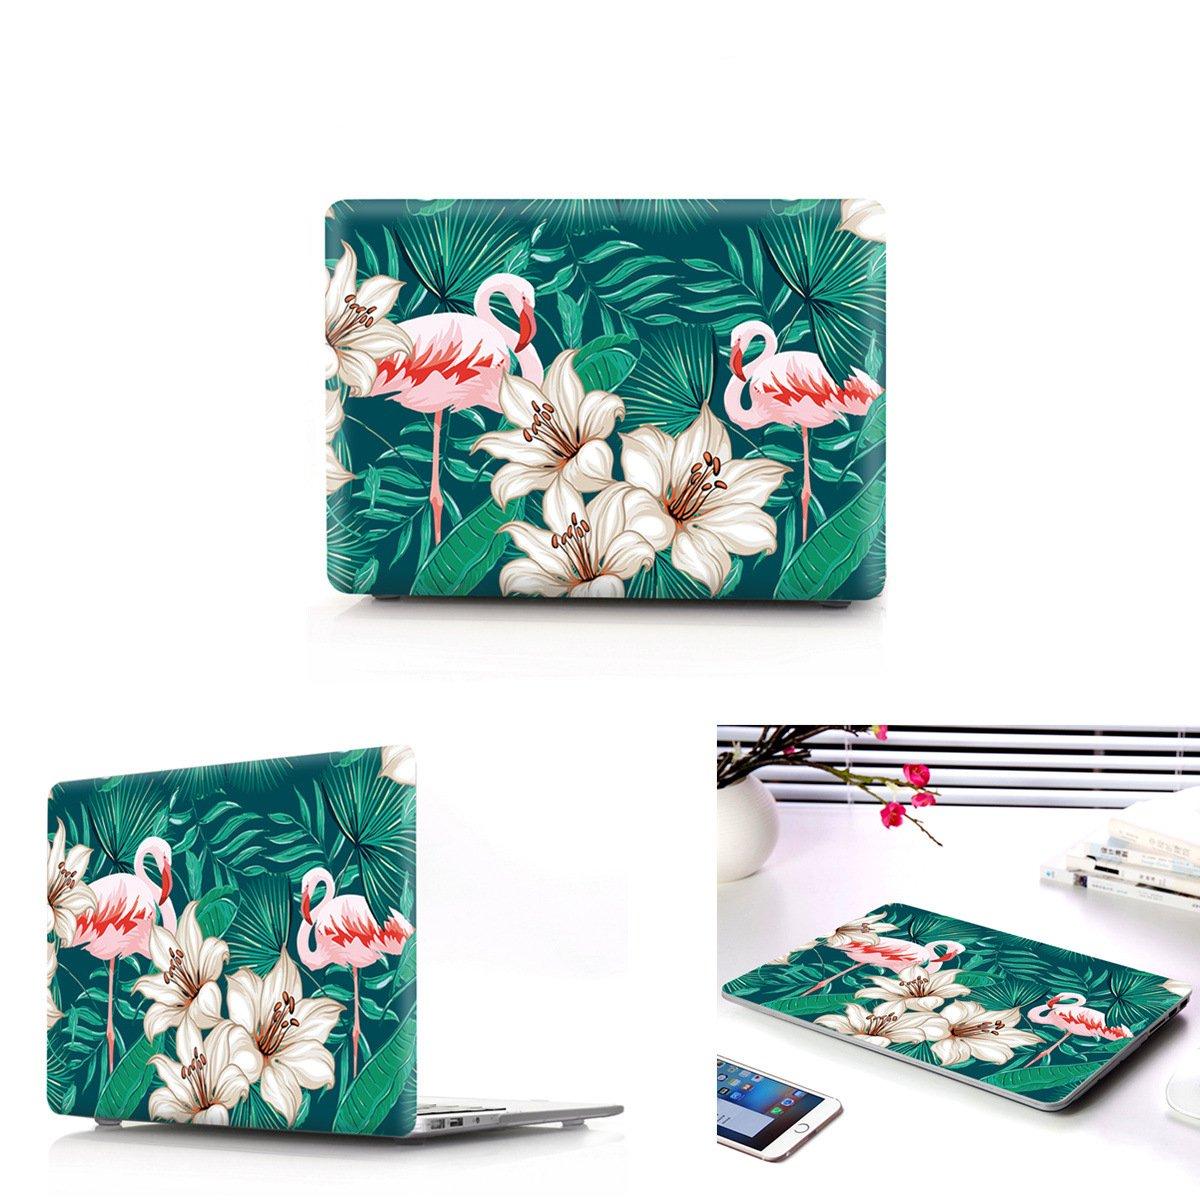 A1369/A1466 Macbook Air 13 Inch Case Cover,Plastic Hard Protective Shells Macbook Case for Macbook Shells Air 13 Inch (H-11 Flamingos) 4e5298